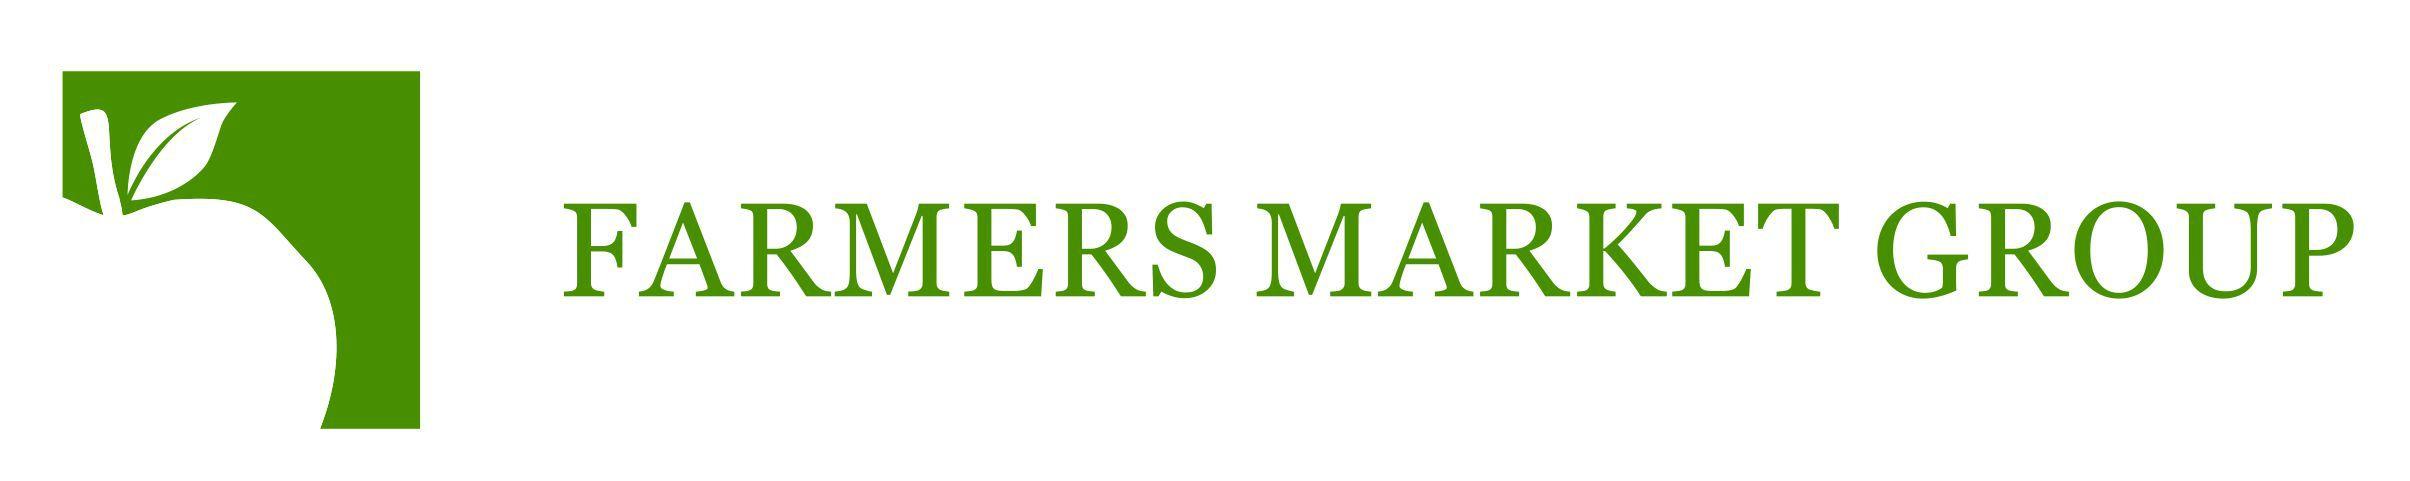 Farmers Market Group